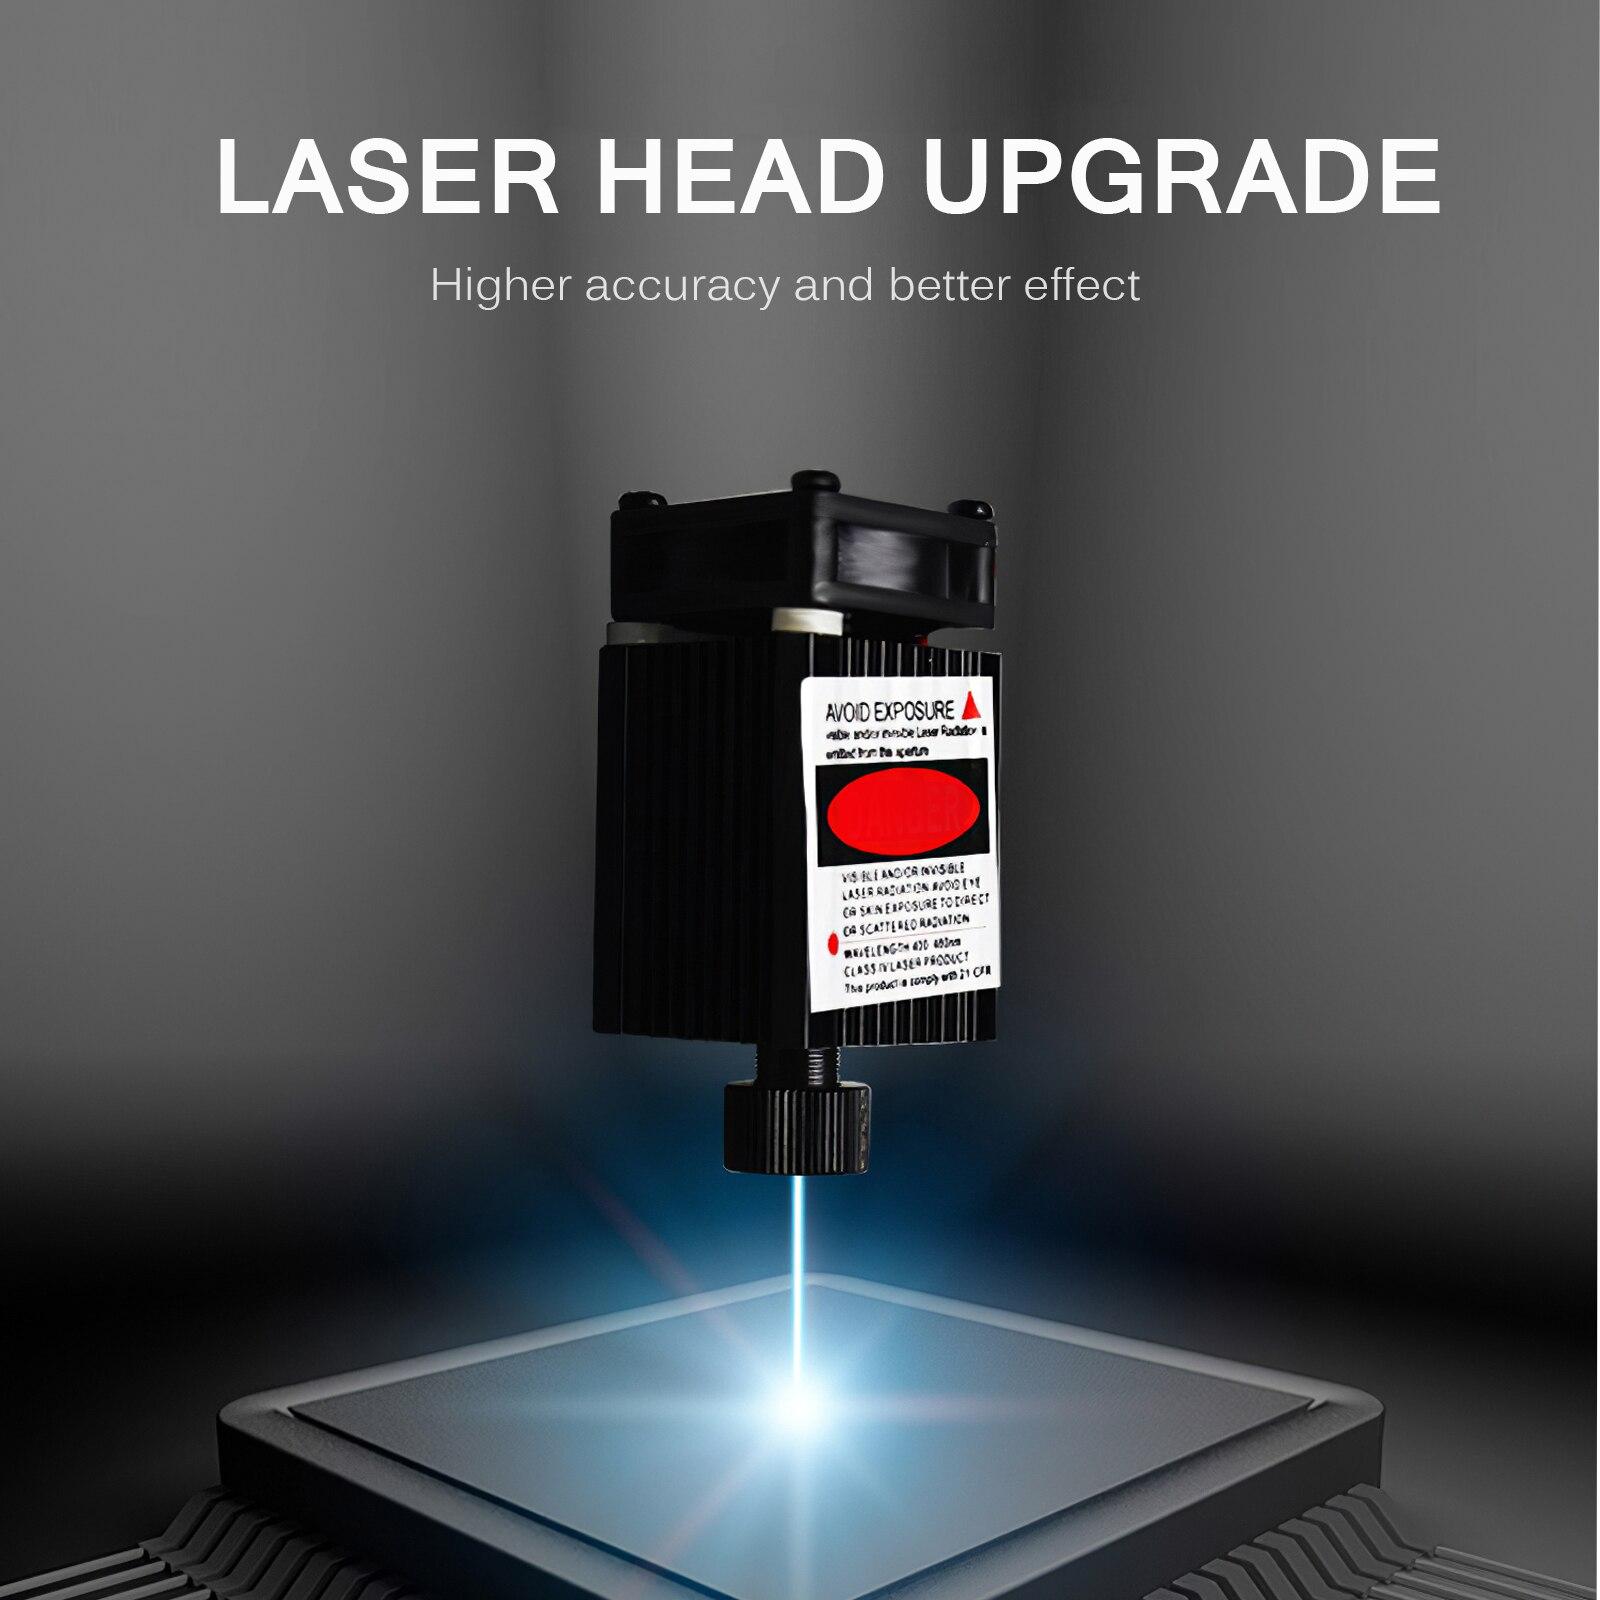 3000mw Mini CNC Machine Desktop Laser Engraver Household Desktop Printer Portable Engraver Machine Laser Engraving Cutter enlarge